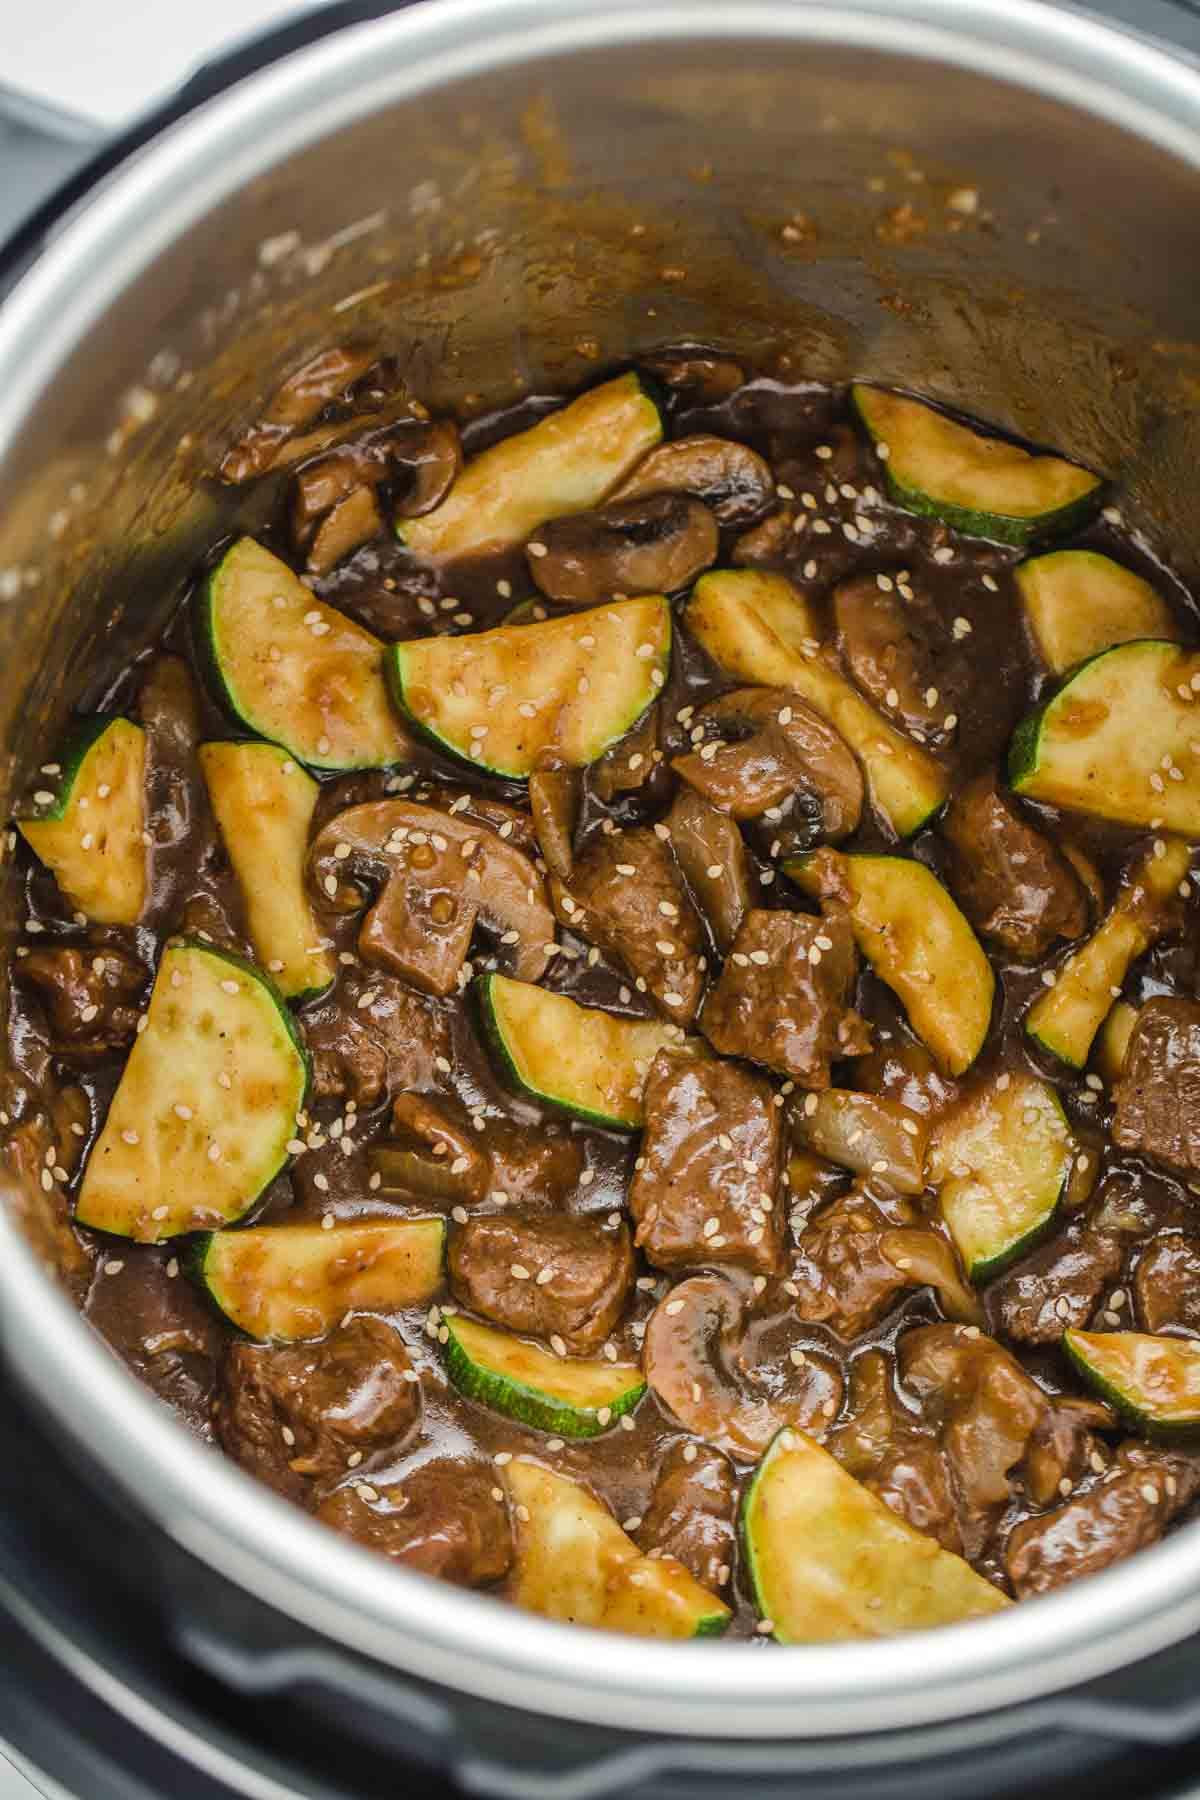 A close up shot of hibachi steak done in the instant pot